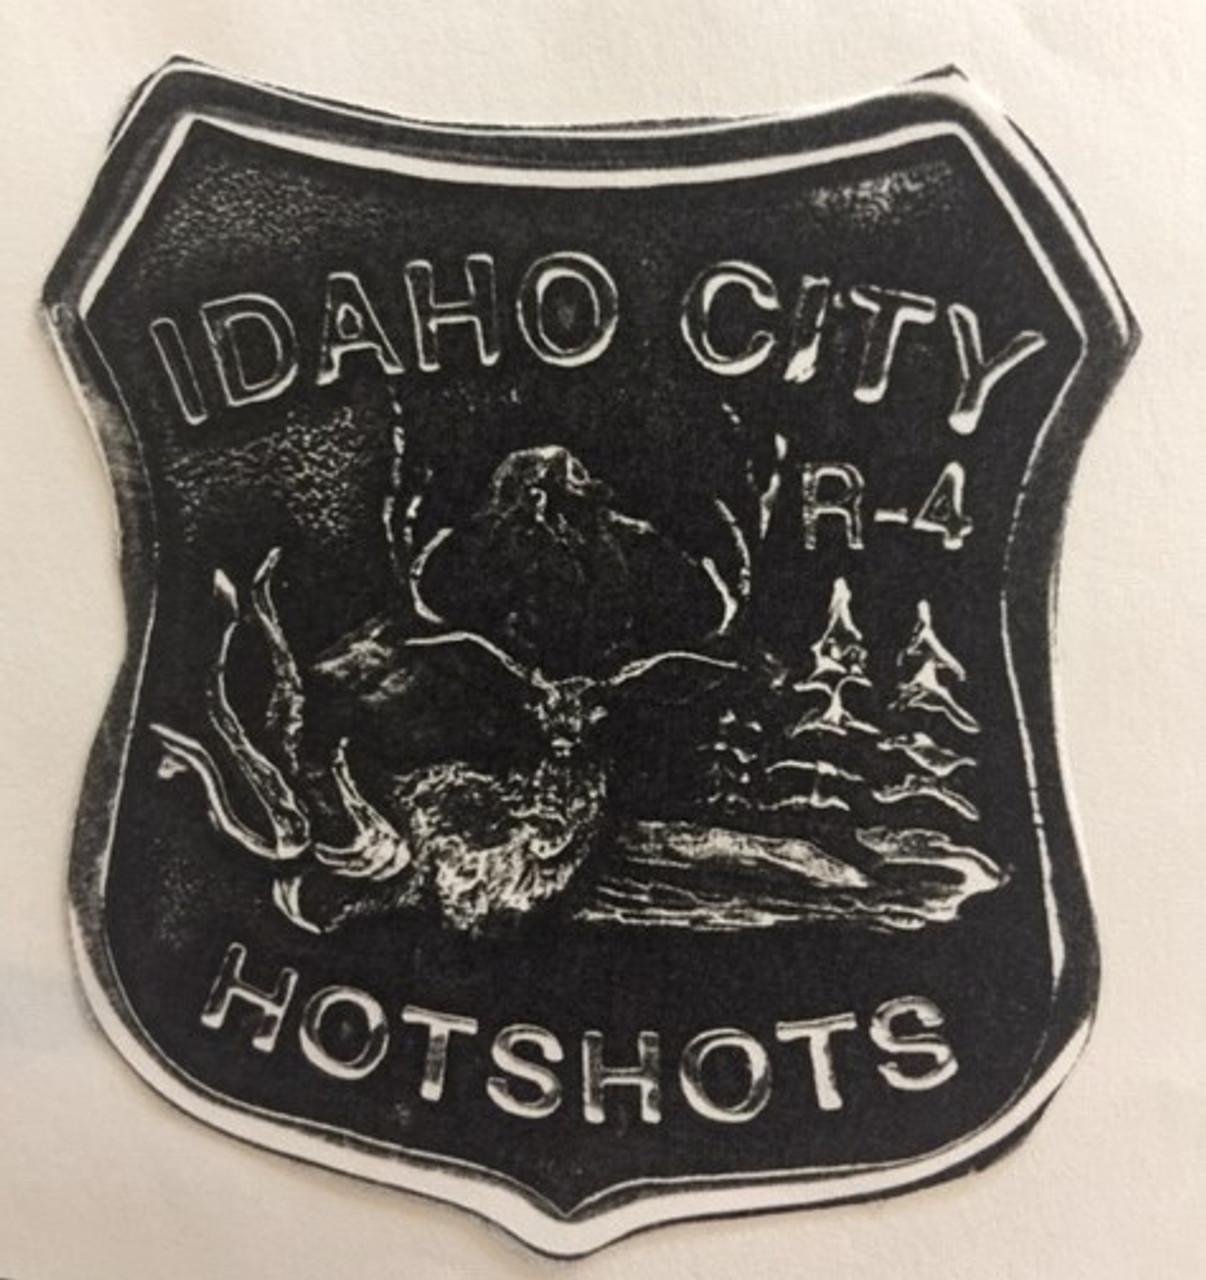 Idaho City Hotshots Buckle (RESTRICTED)